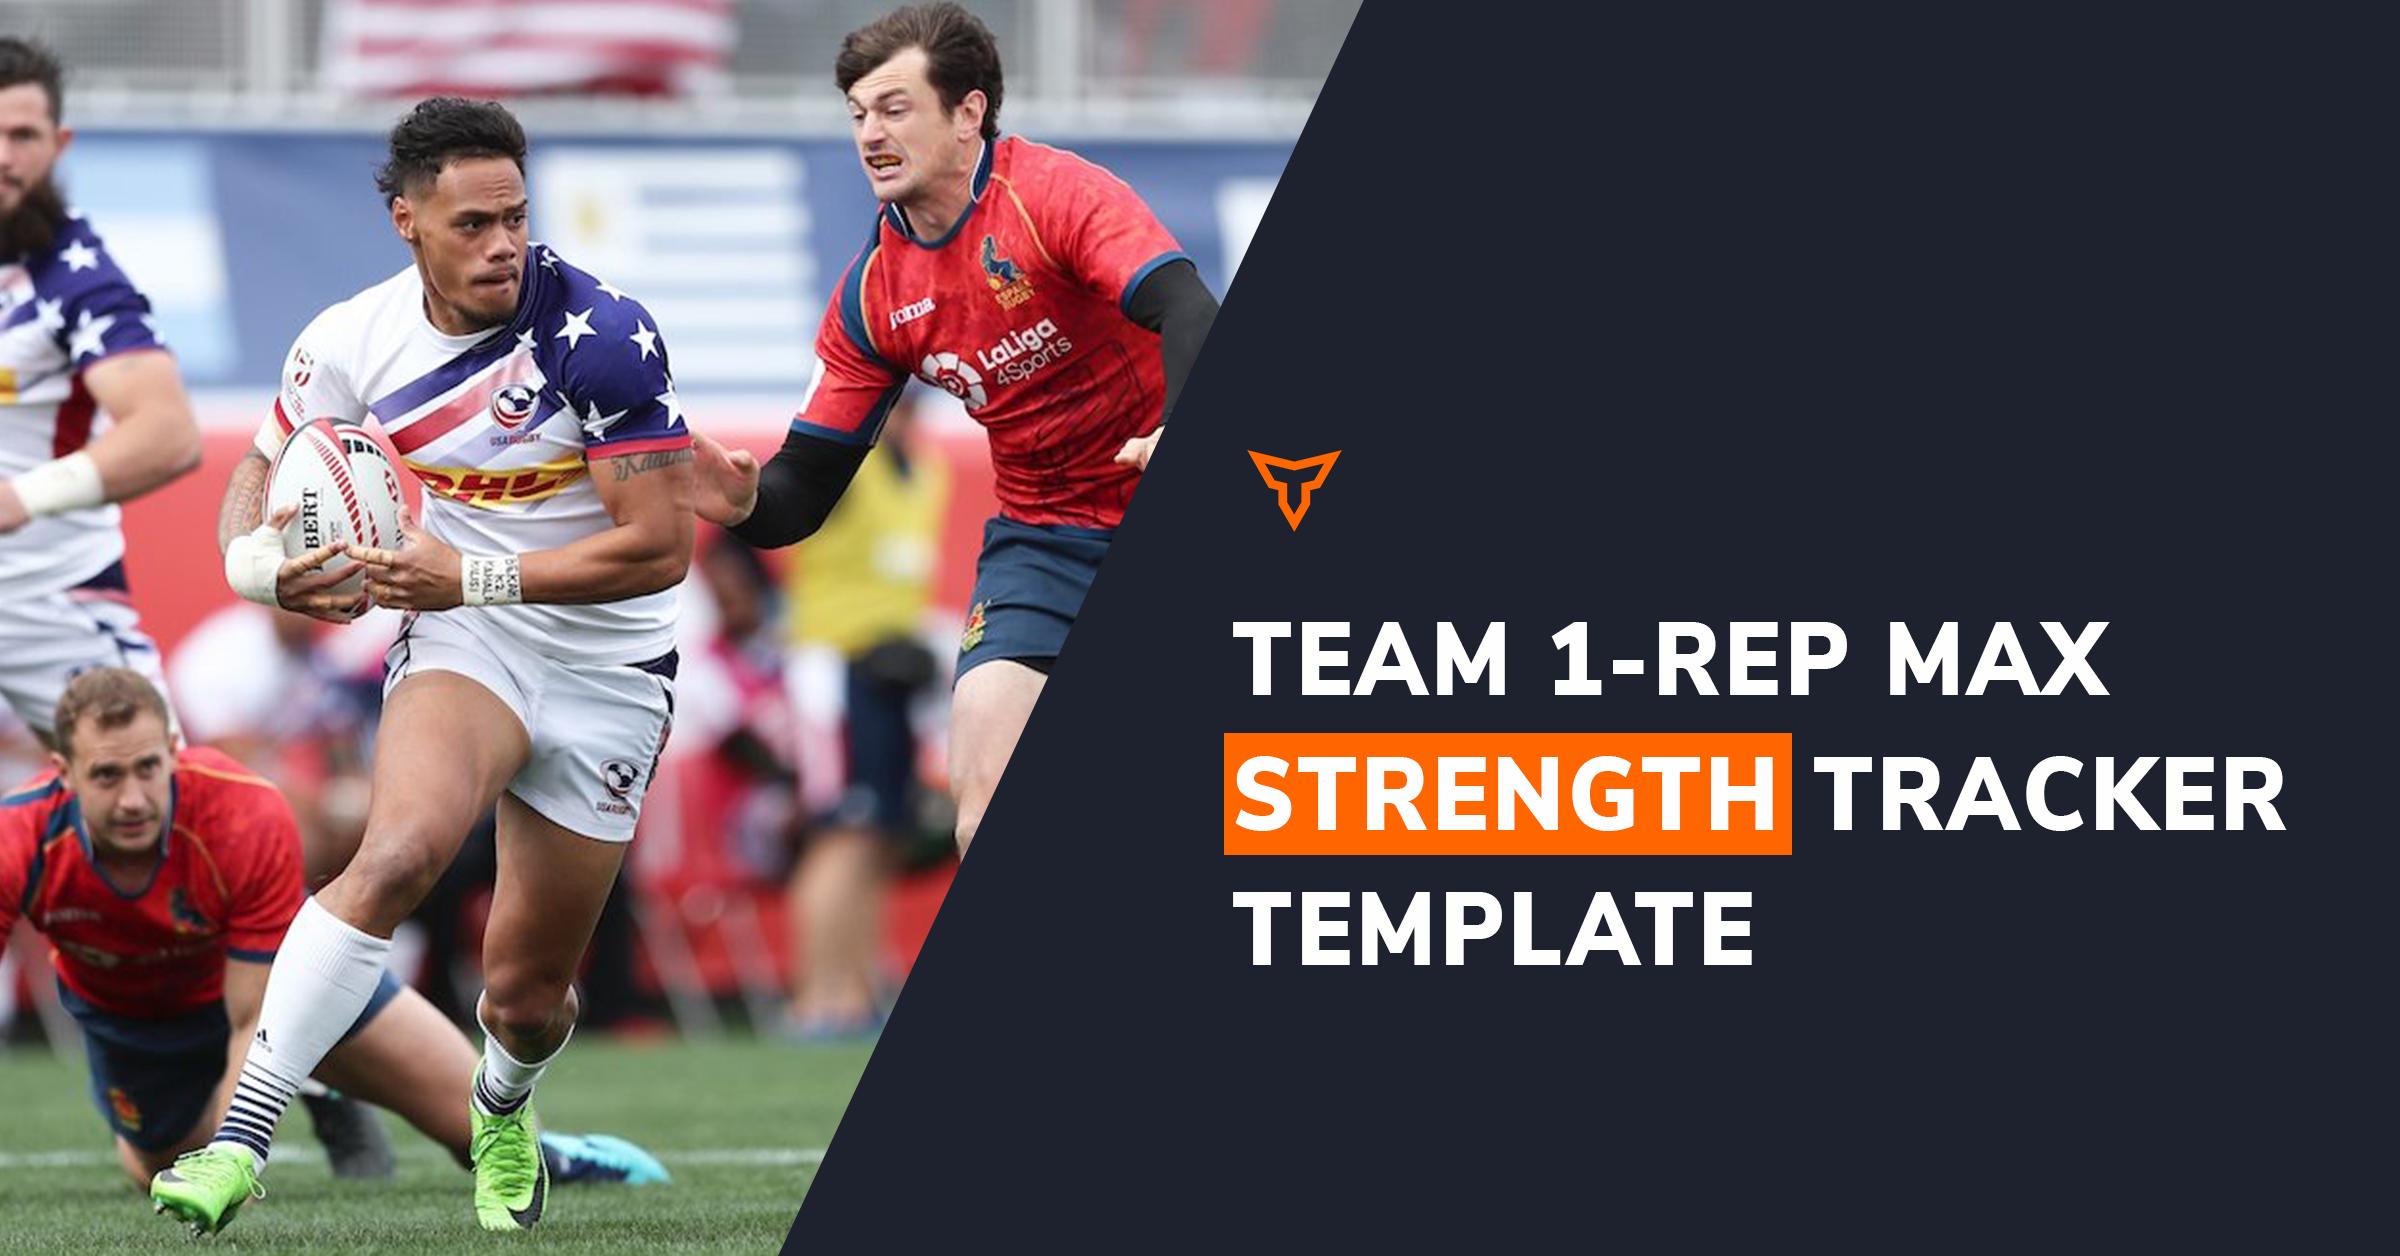 Team Strength Tracker